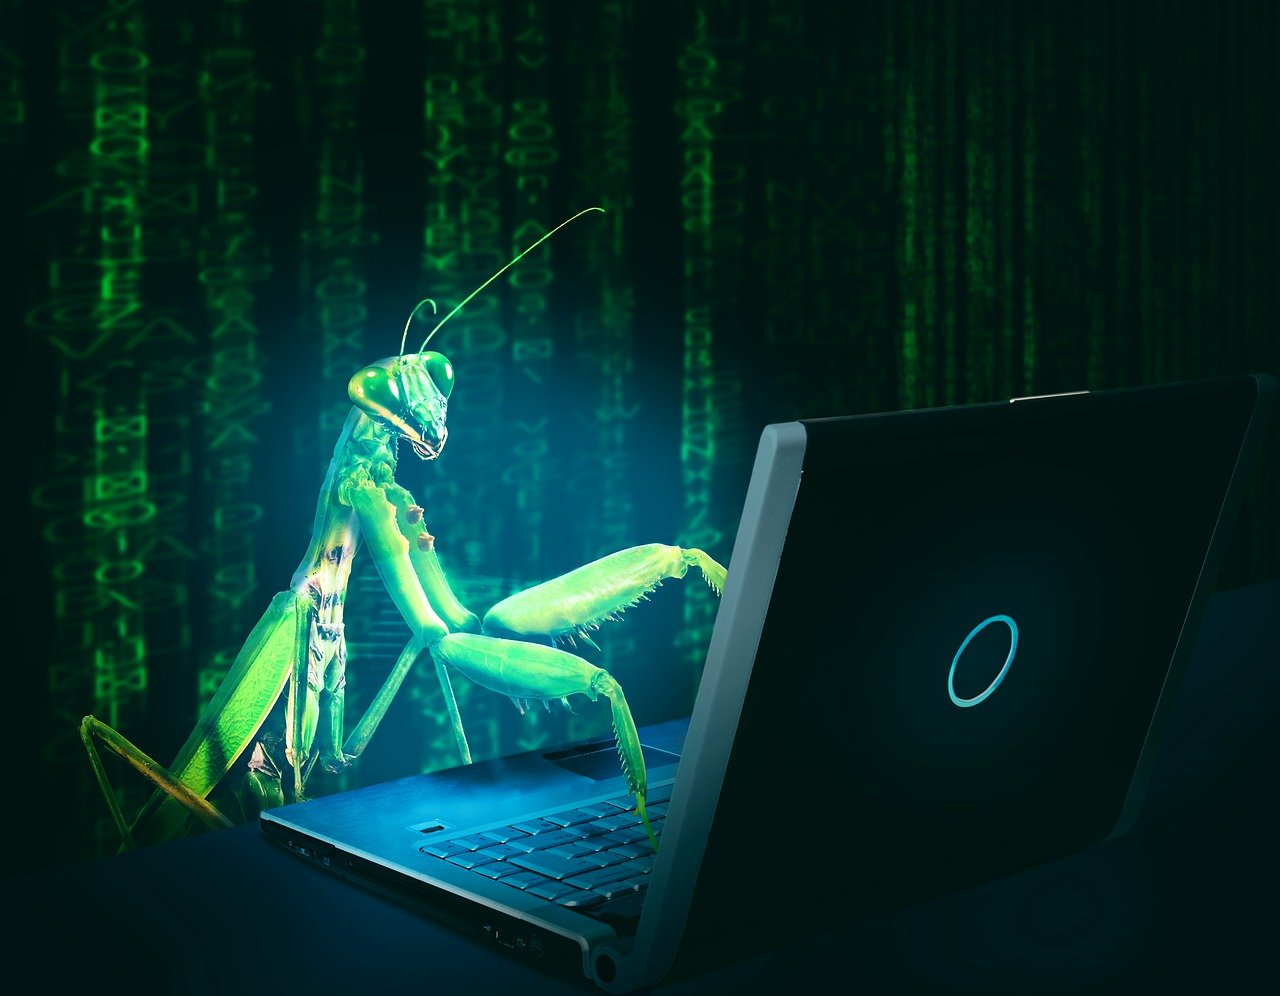 bug, virus, computer-4297771.jpg